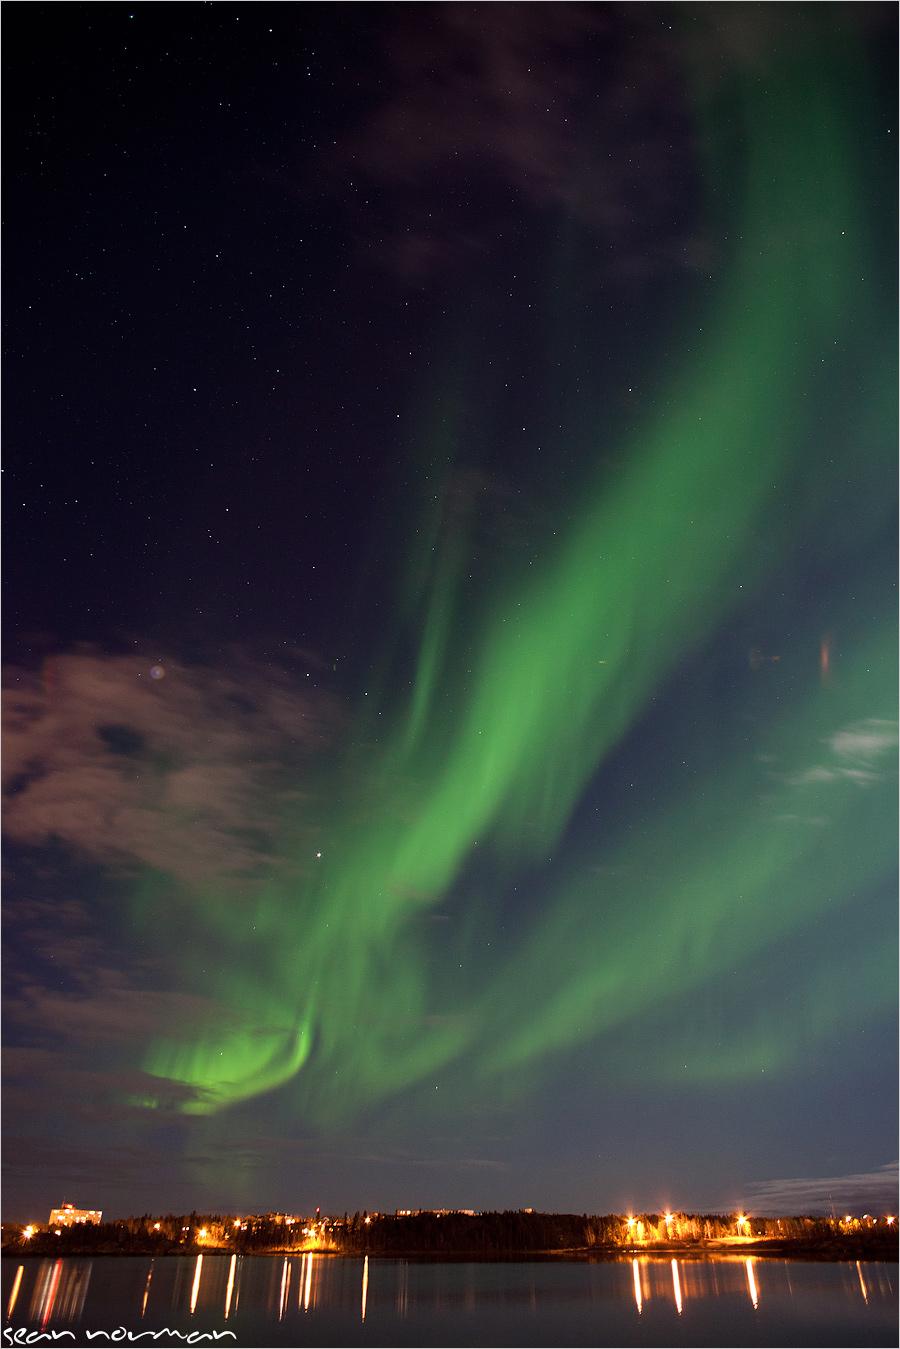 chasing northern lights yellowknife canada